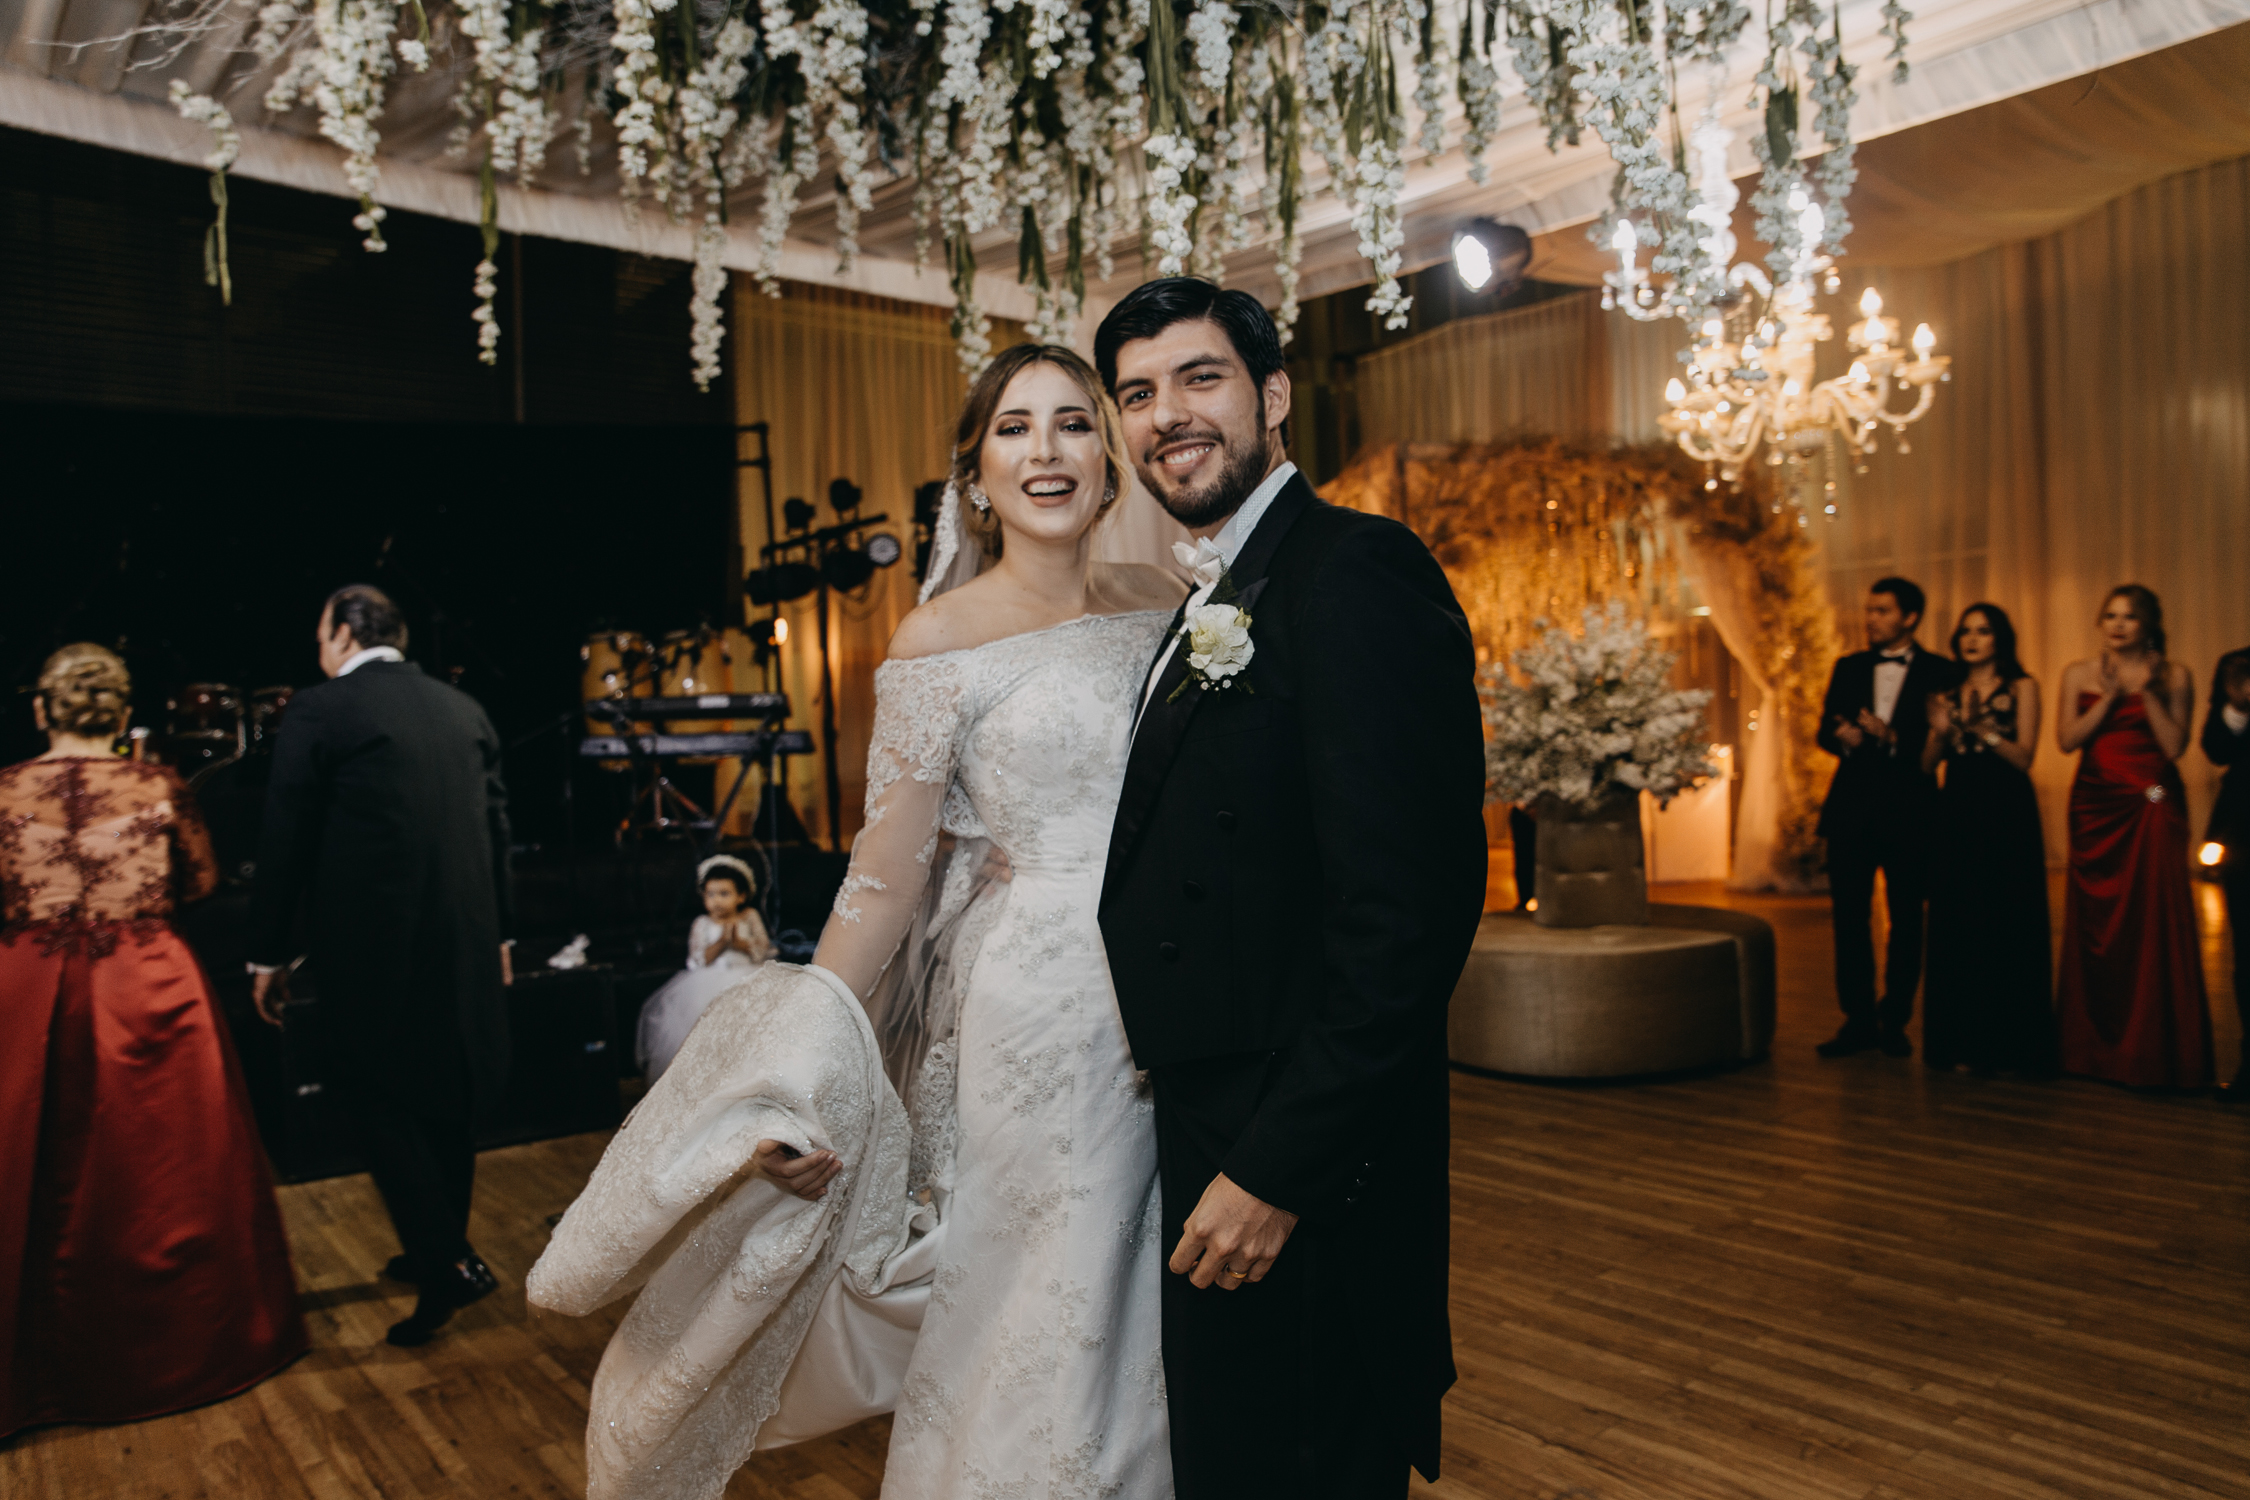 Michelle-Agurto-Fotografia-Bodas-Ecuador-Destination-Wedding-Photographer-Vicky-Javier-148.JPG